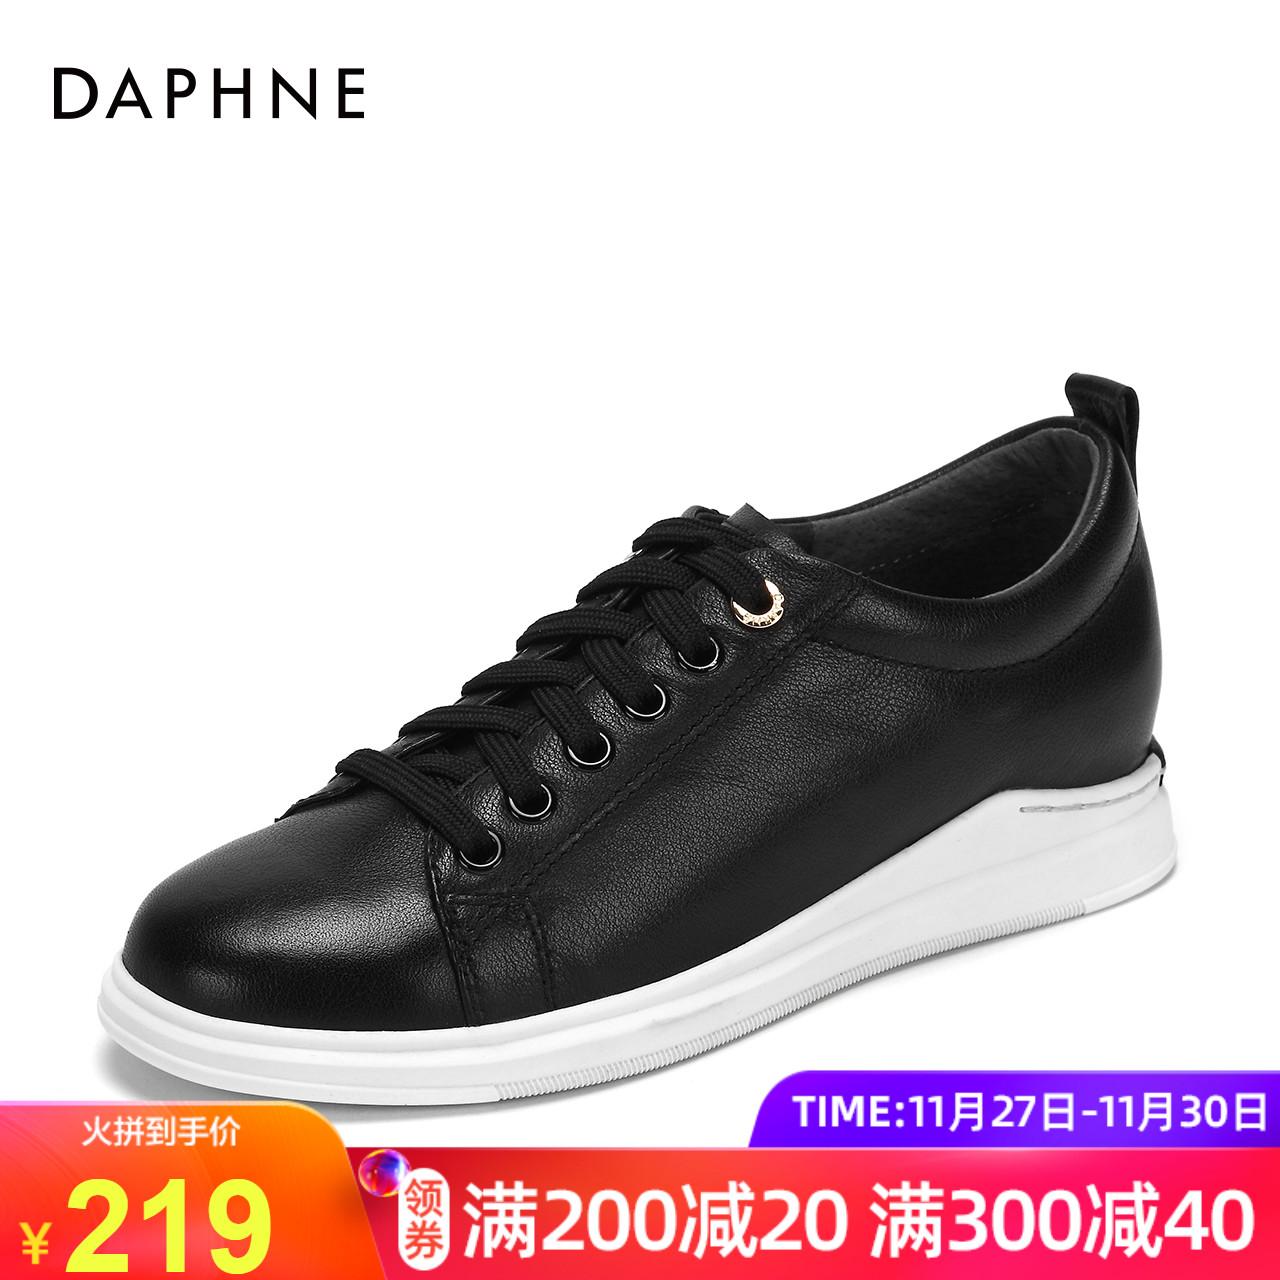 Daphne/达芙妮秋季新款牛皮简约舒适运动鞋纯色平底板鞋女